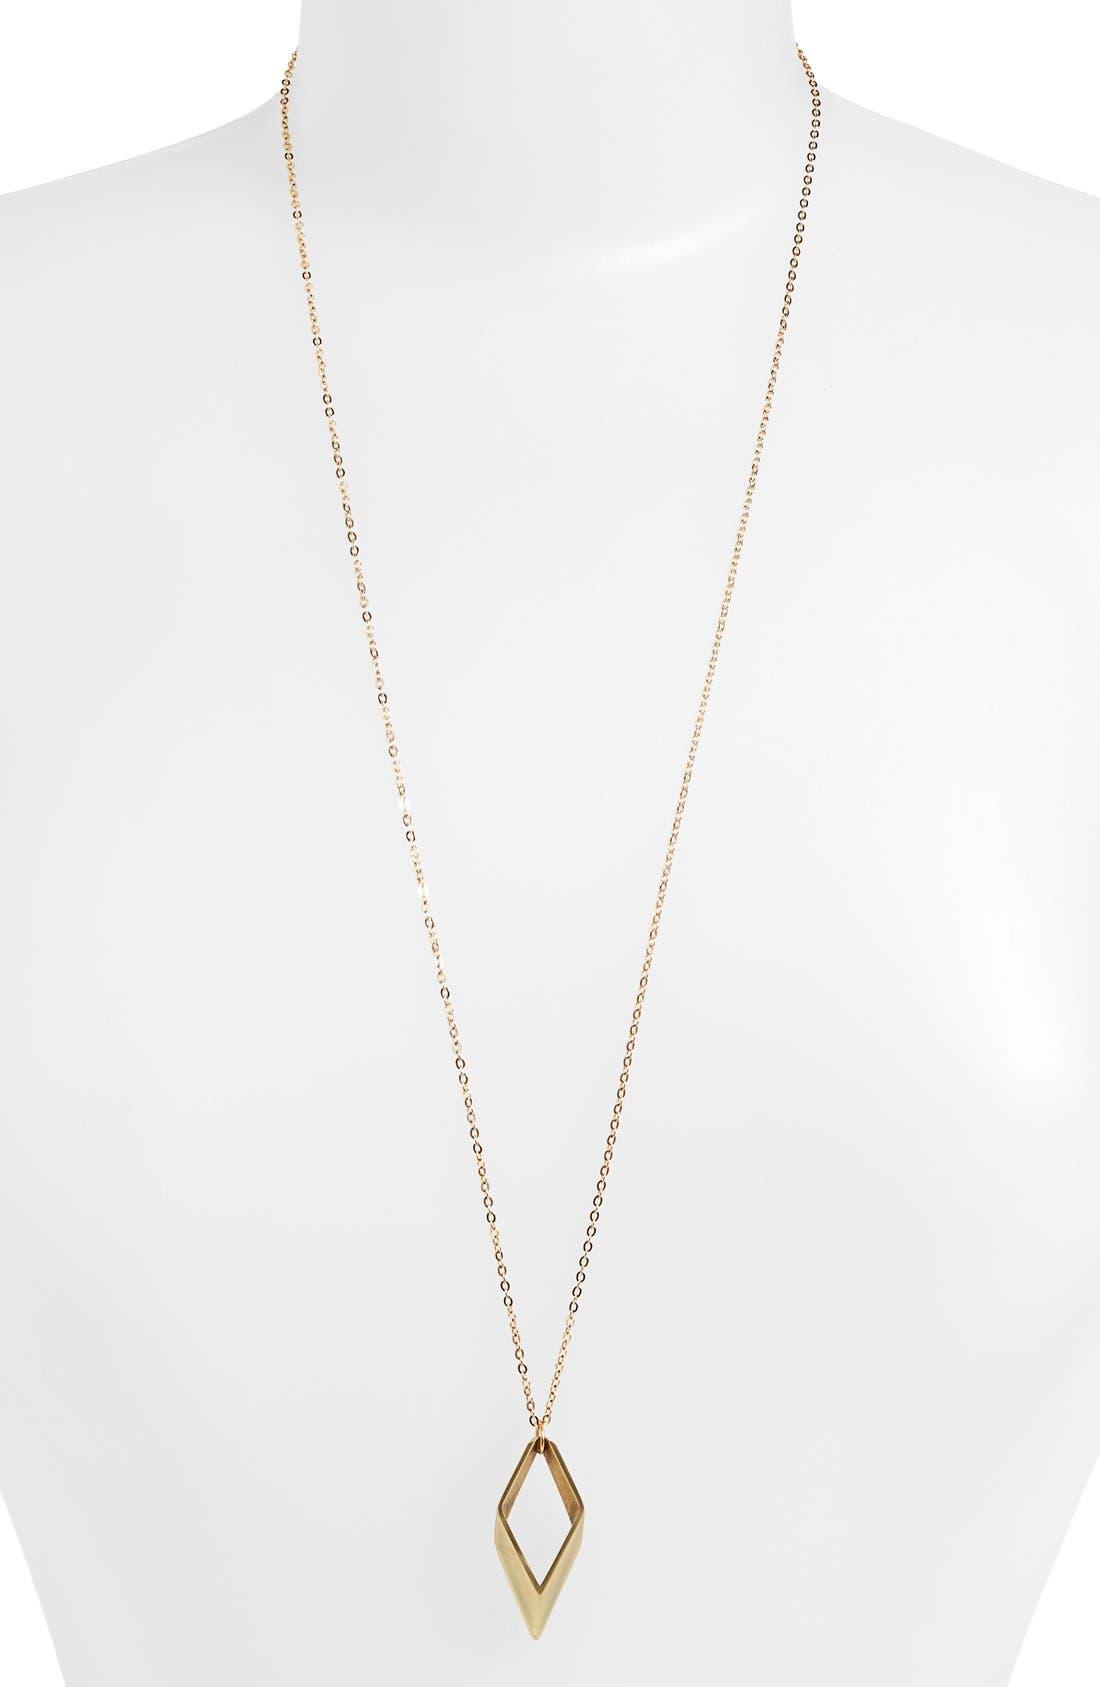 Main Image - Baleen 'Parallelogram' Pendant Necklace